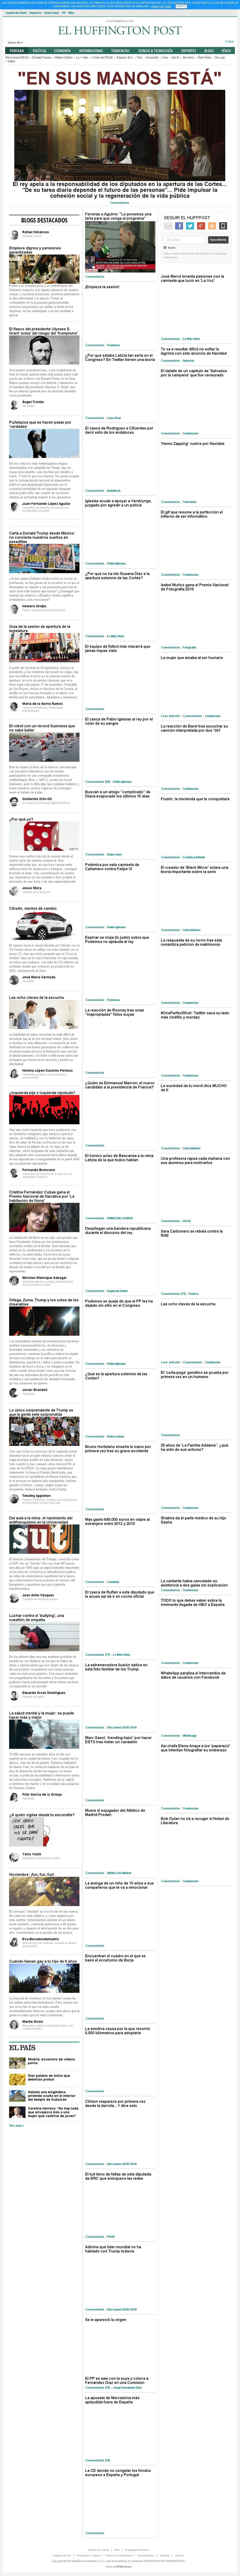 El Huffington Post (Spain) at Thursday Nov. 17, 2016, 3:07 p.m. UTC